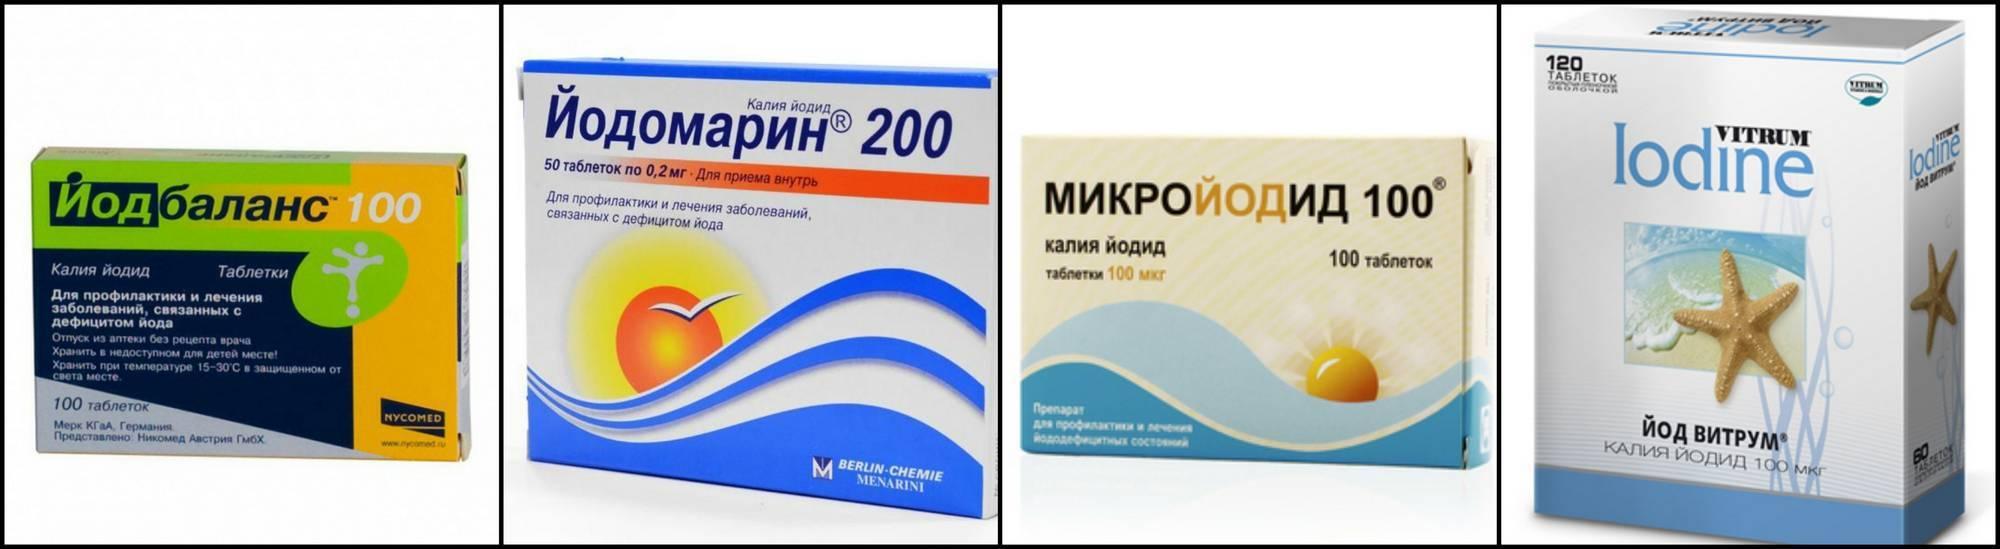 14 аналогов лекарства калия йодид 200 берлин-хеми